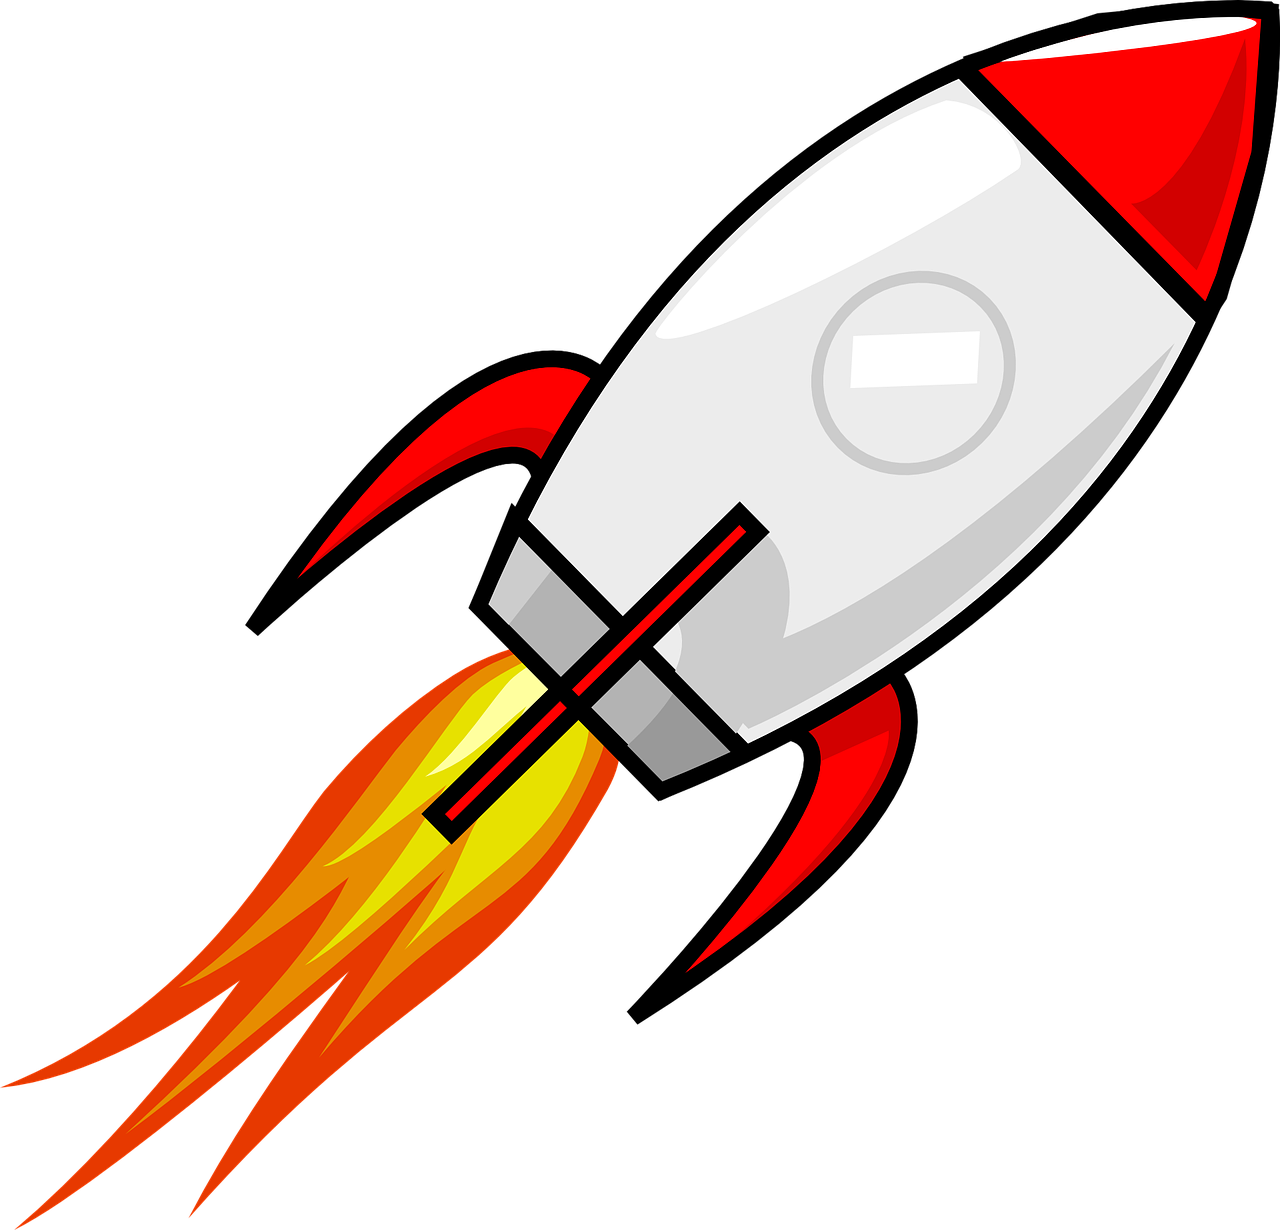 rocket-312767_1280